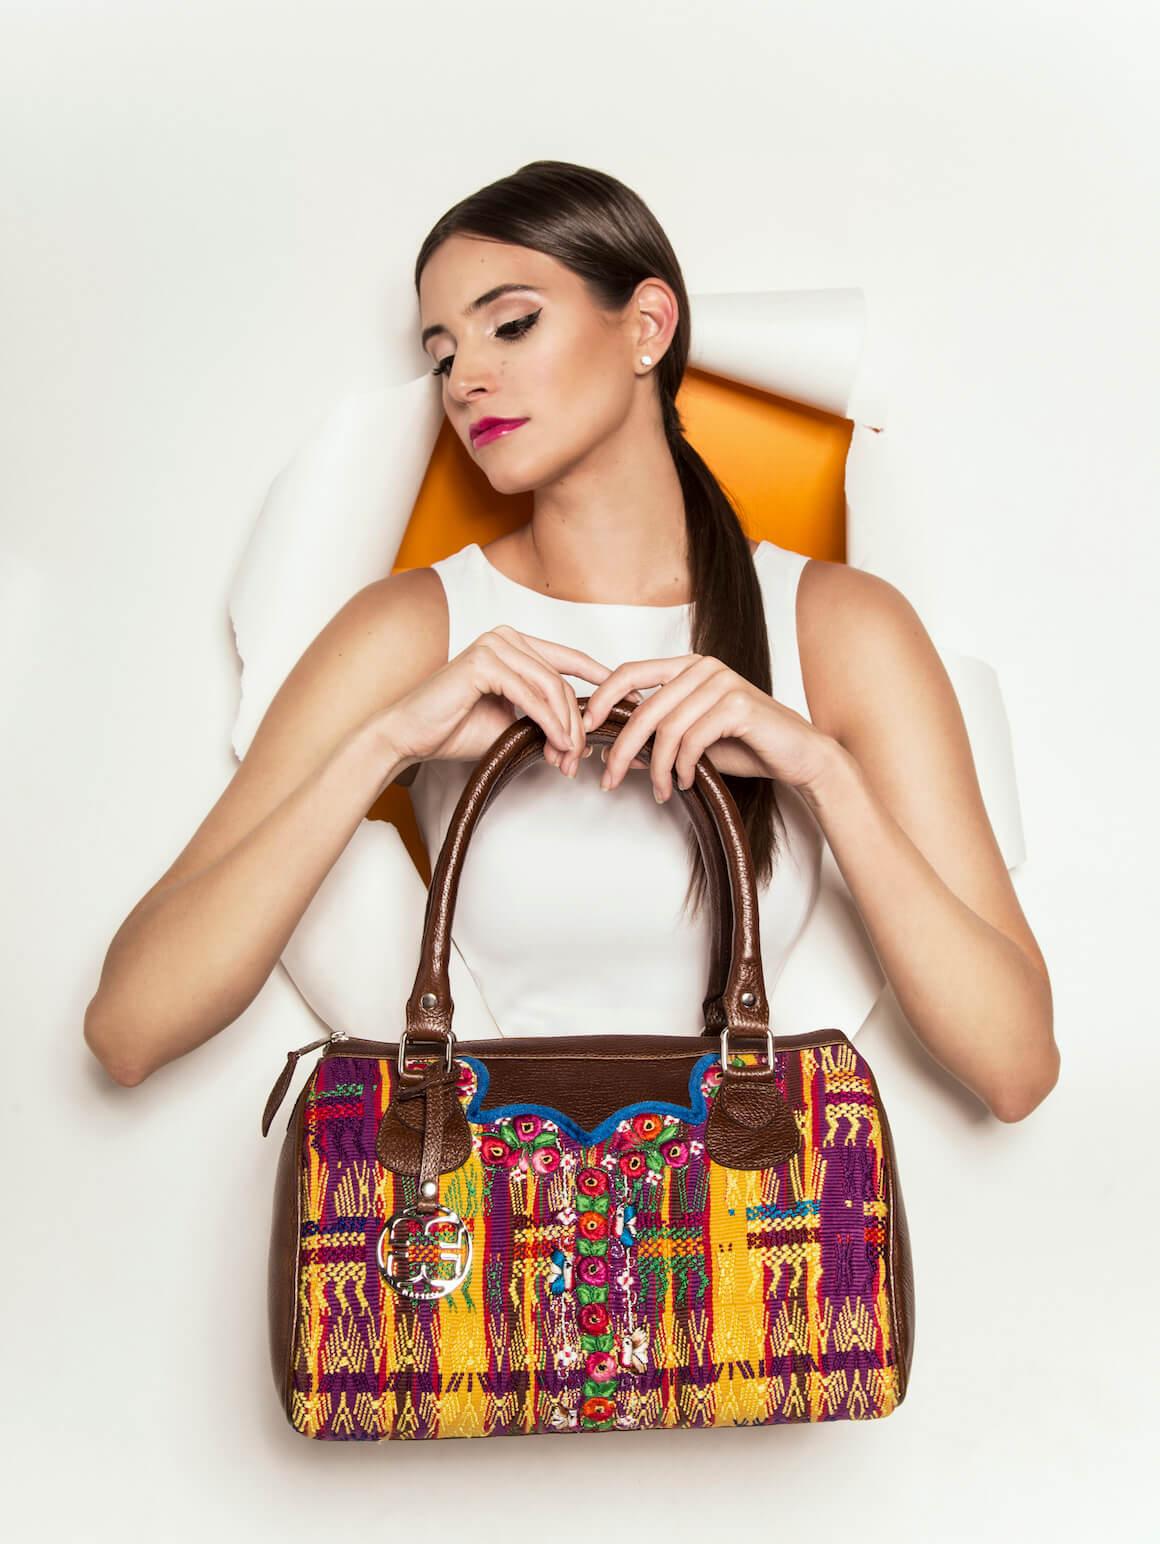 marias-bag-img_1646